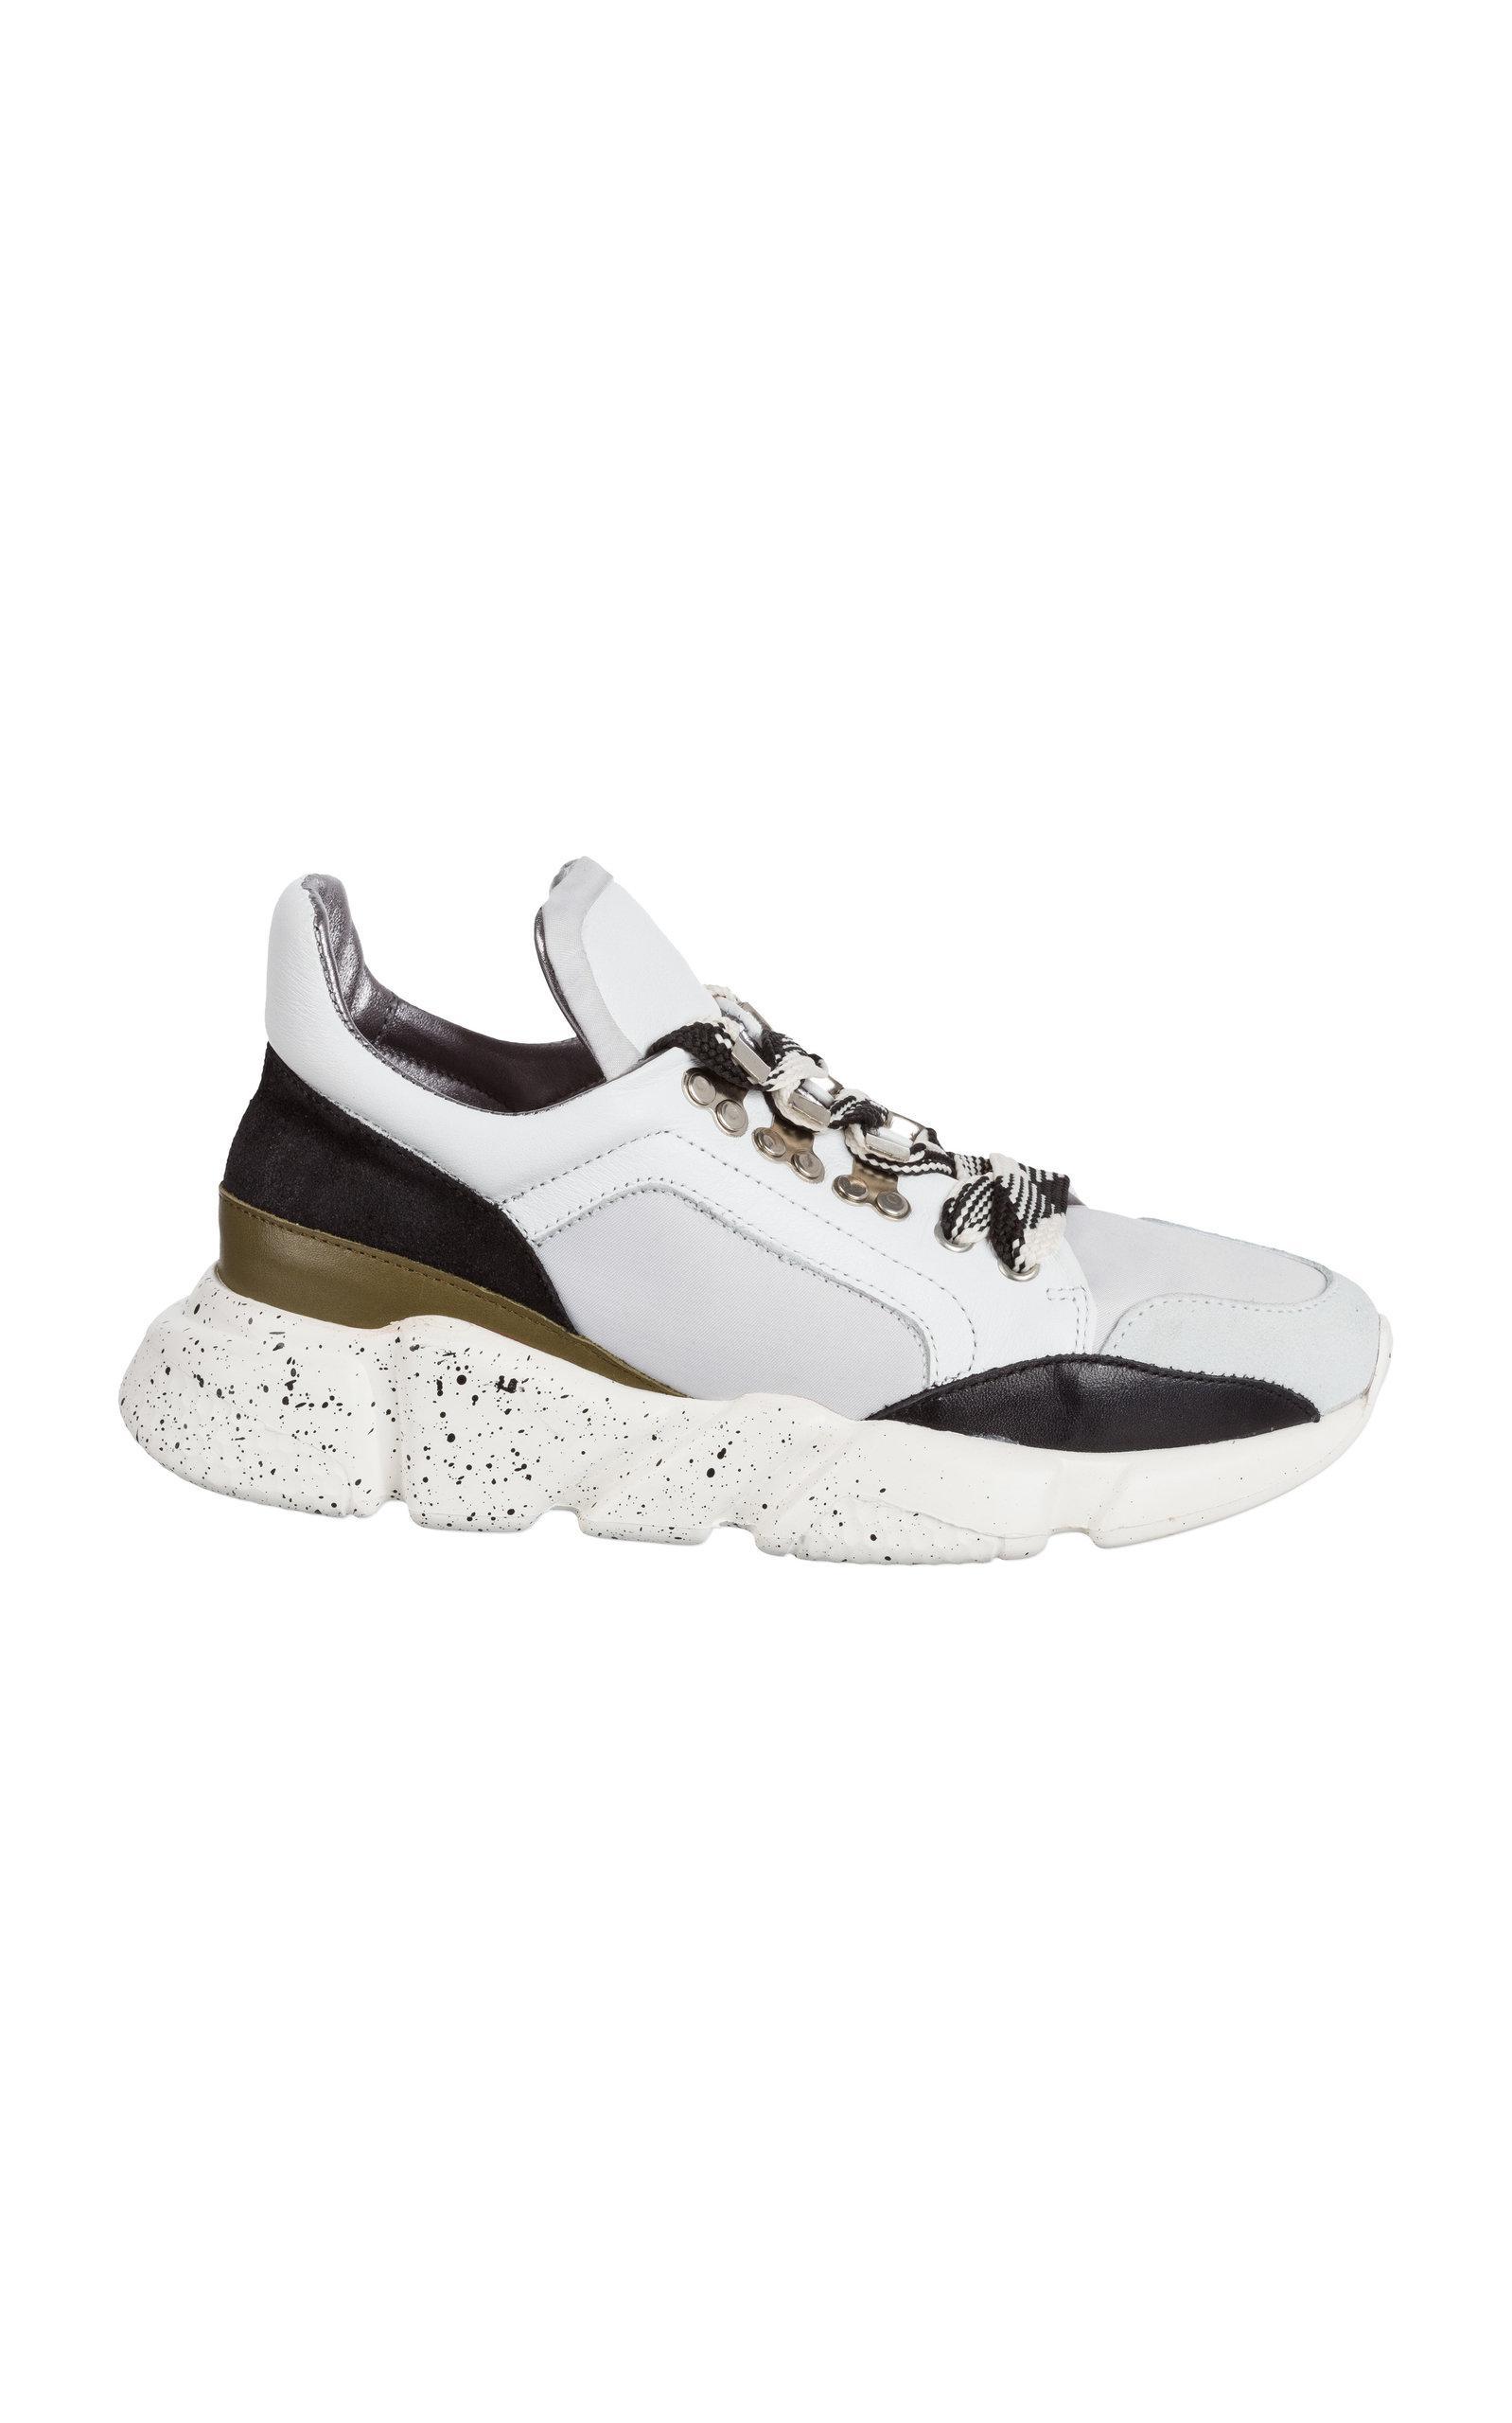 Temptation Men Lyst For Sneaker In Schumacher Trek White Dorothee 0Y7p8EB8